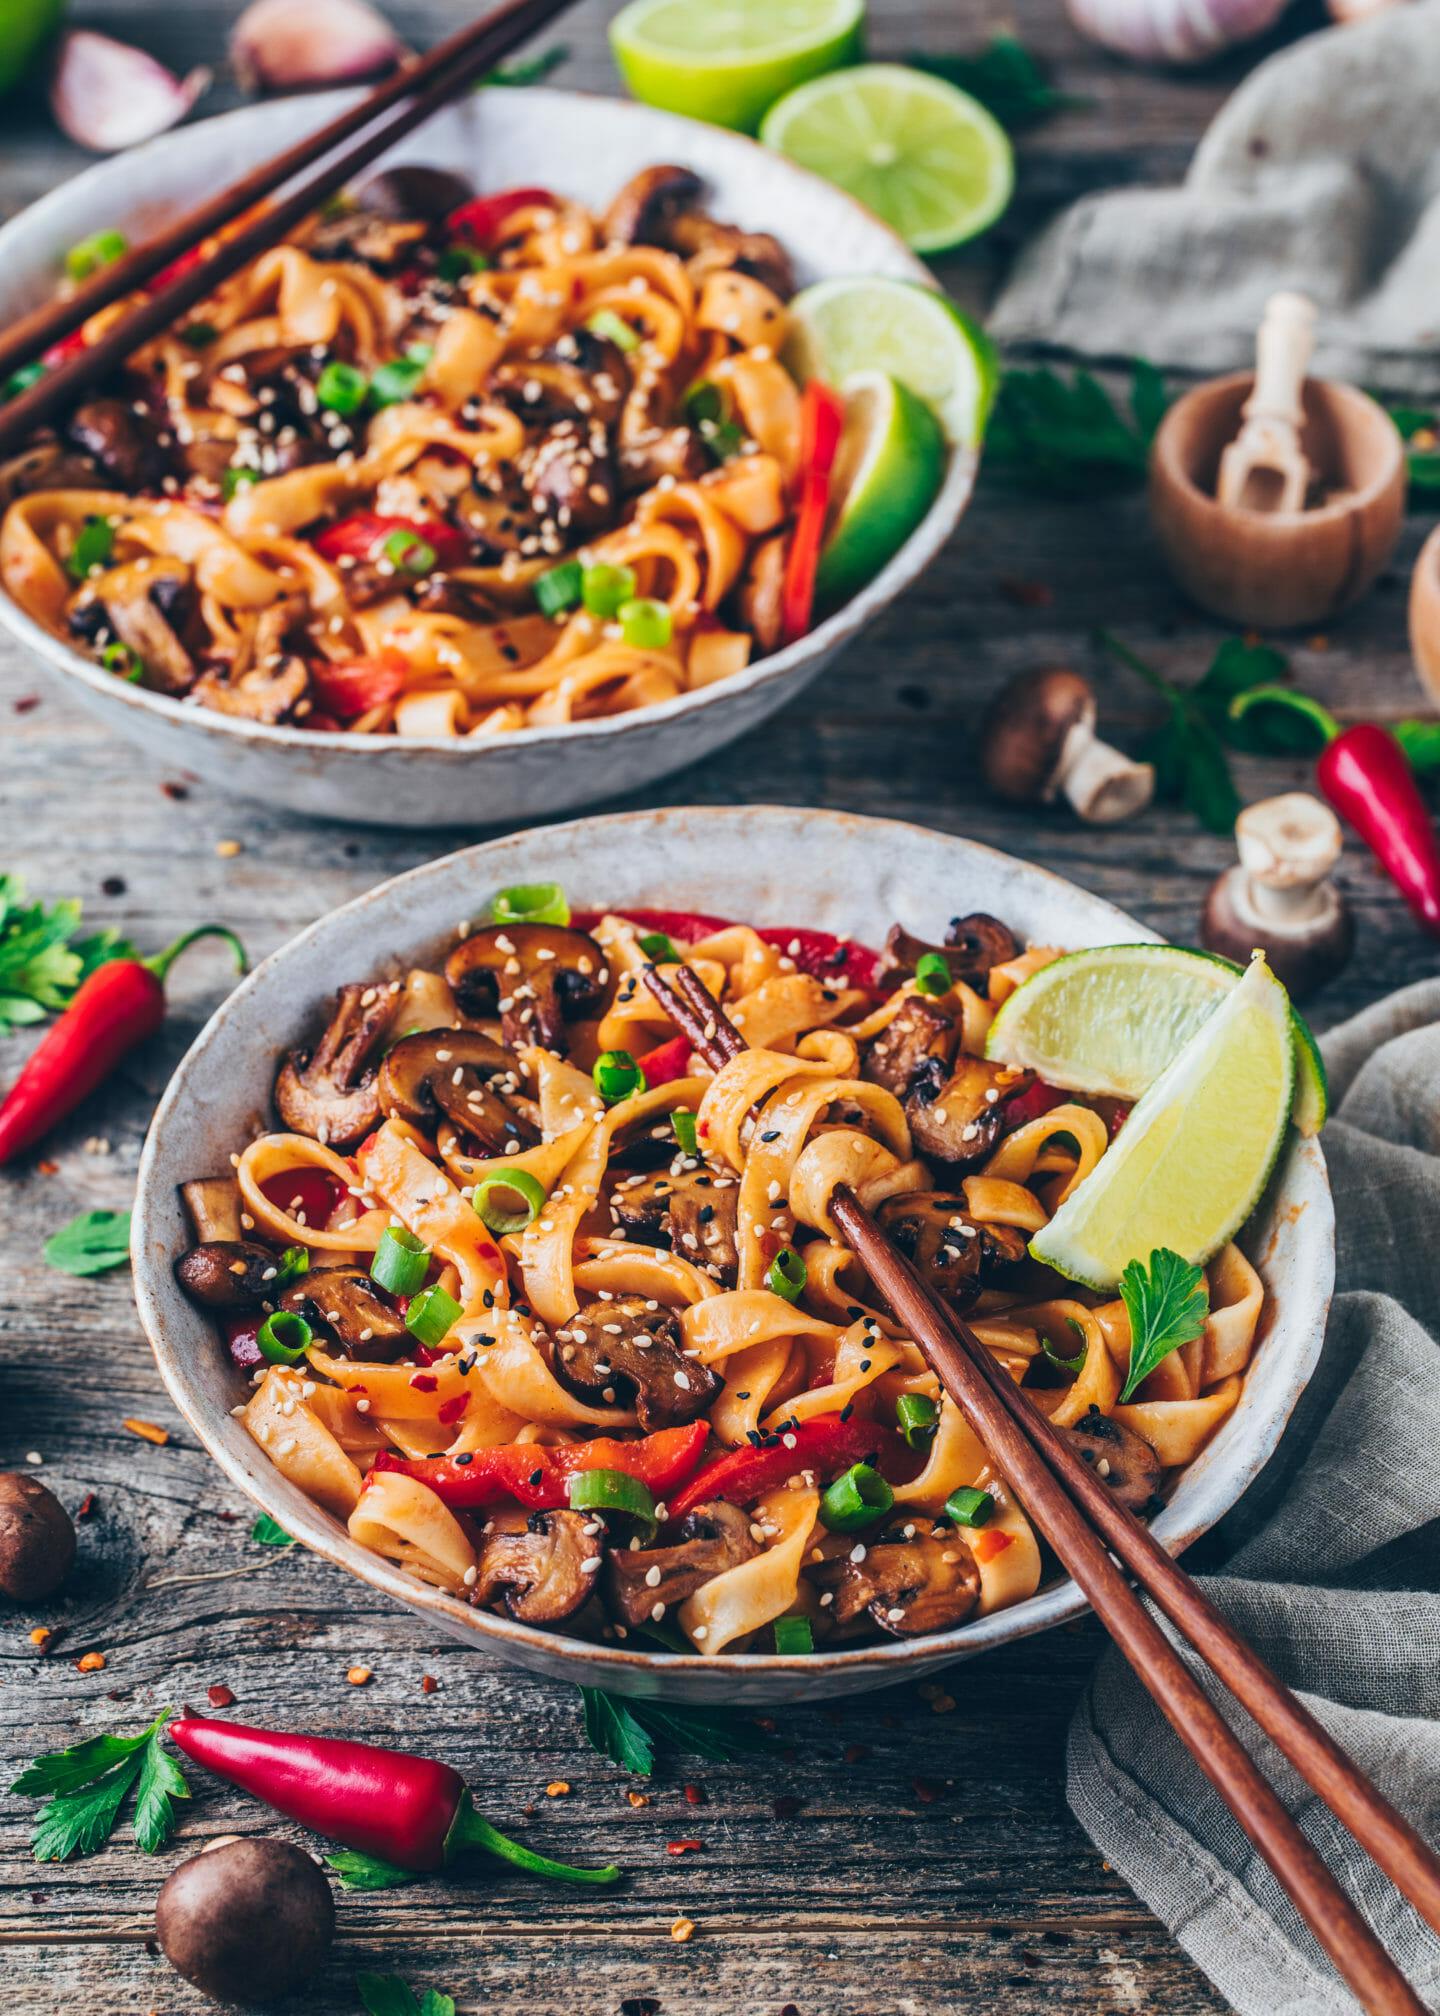 Asian Noodles (20-Minute vegetable Thai Stir-fry)